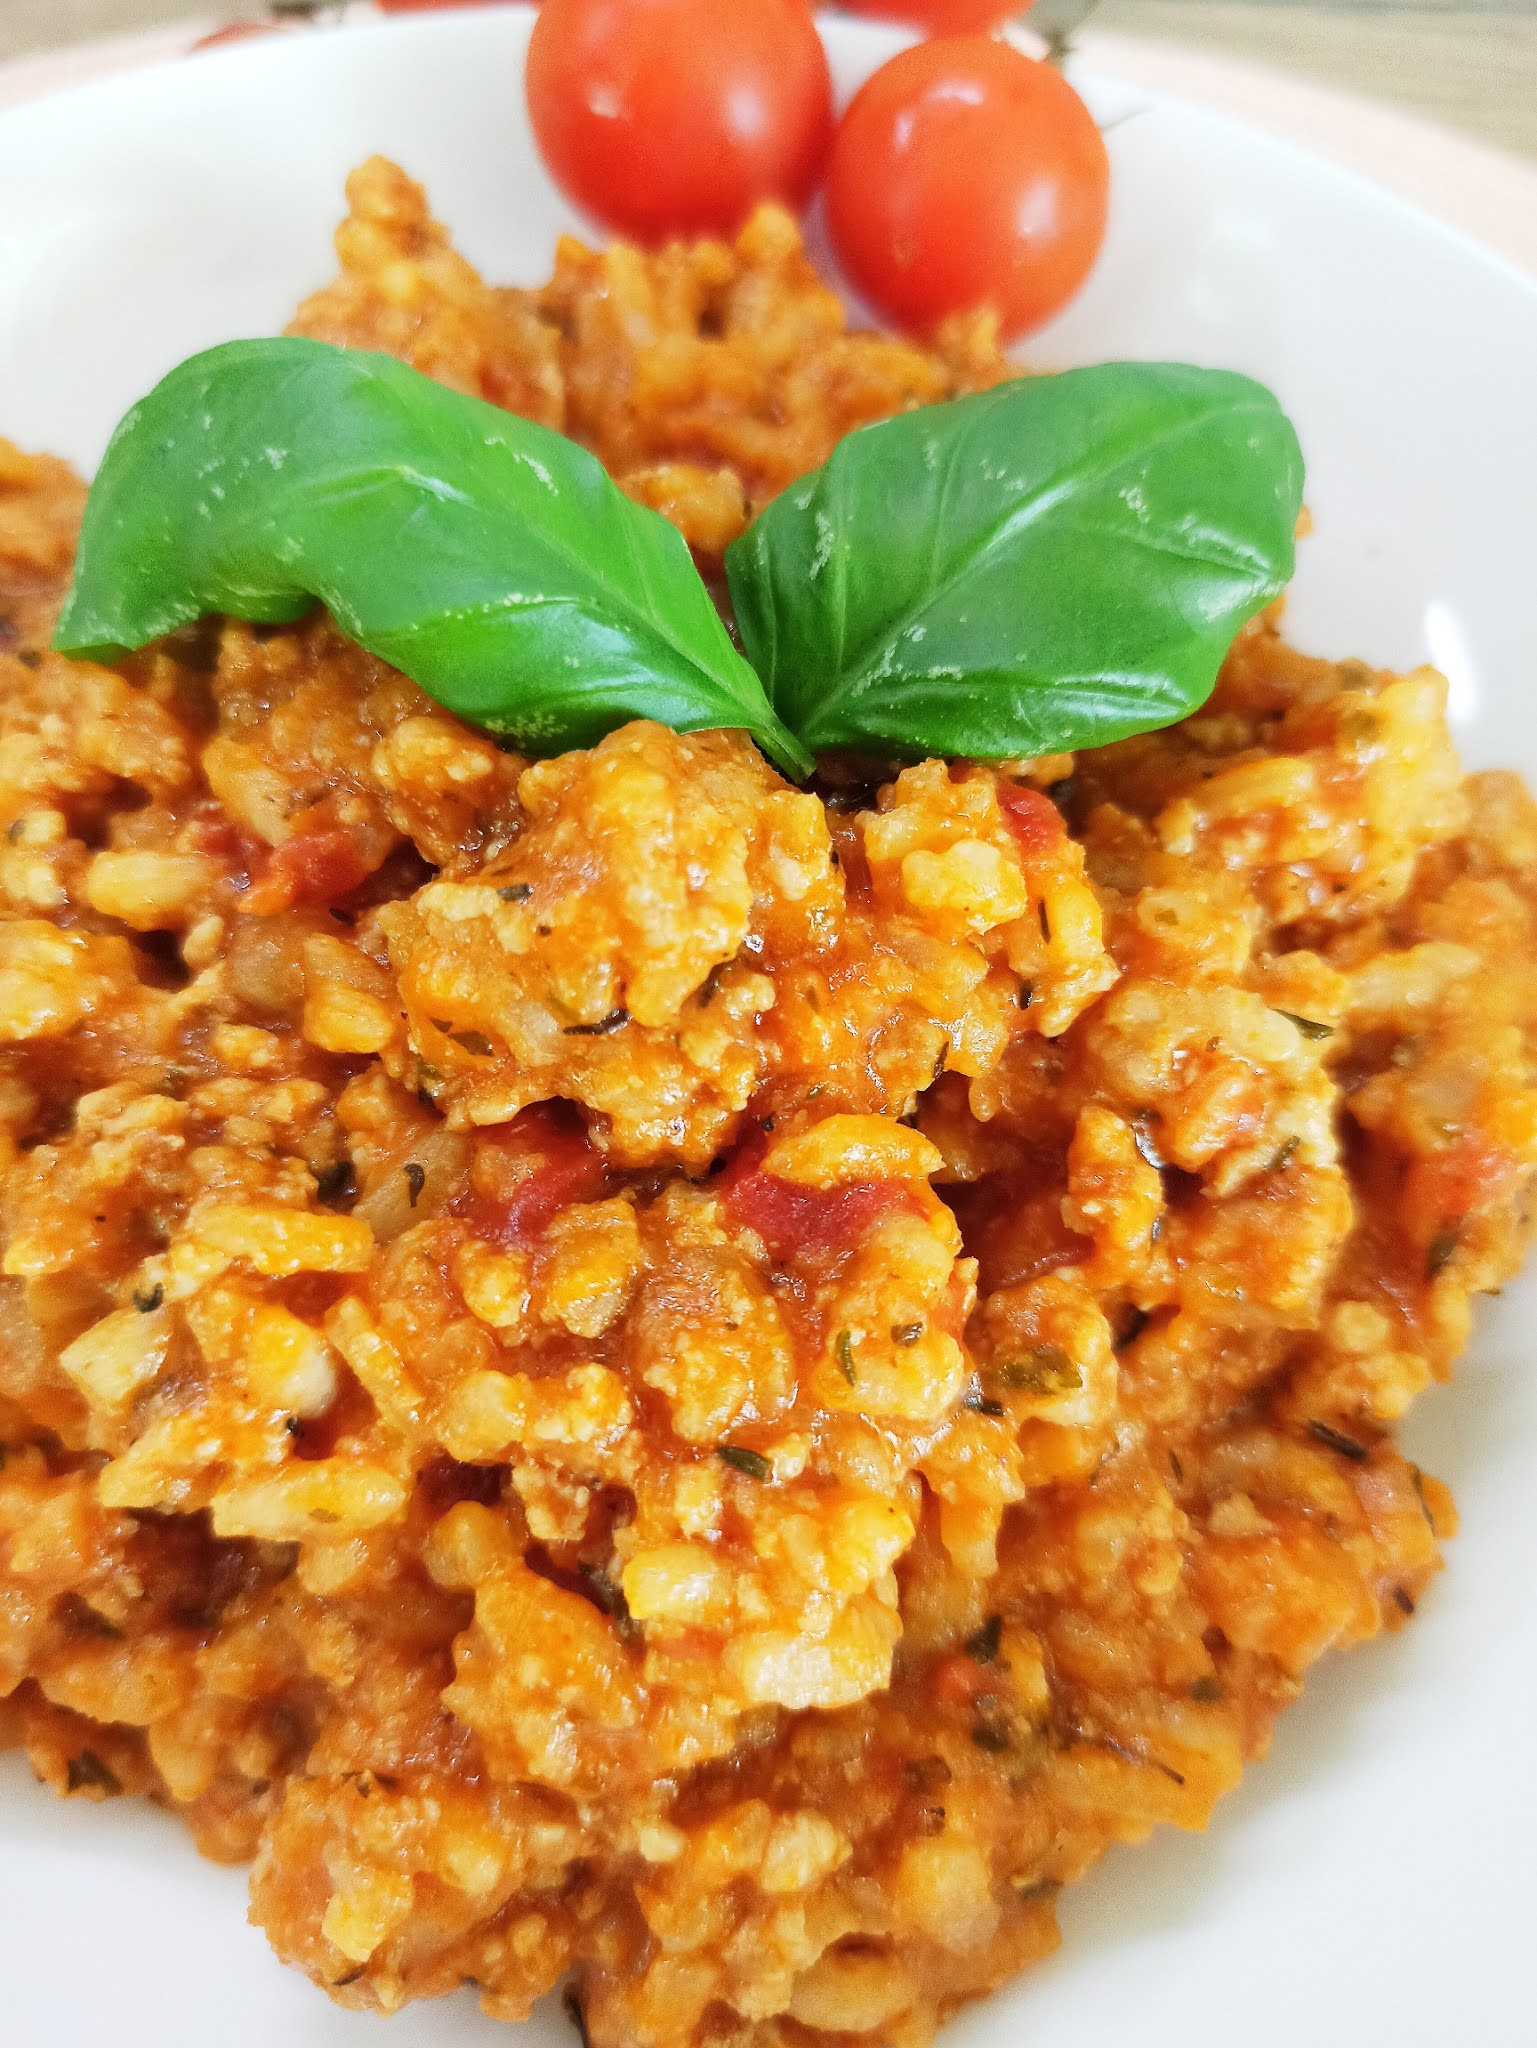 Pomidorowe risotto z mięsem mielonym